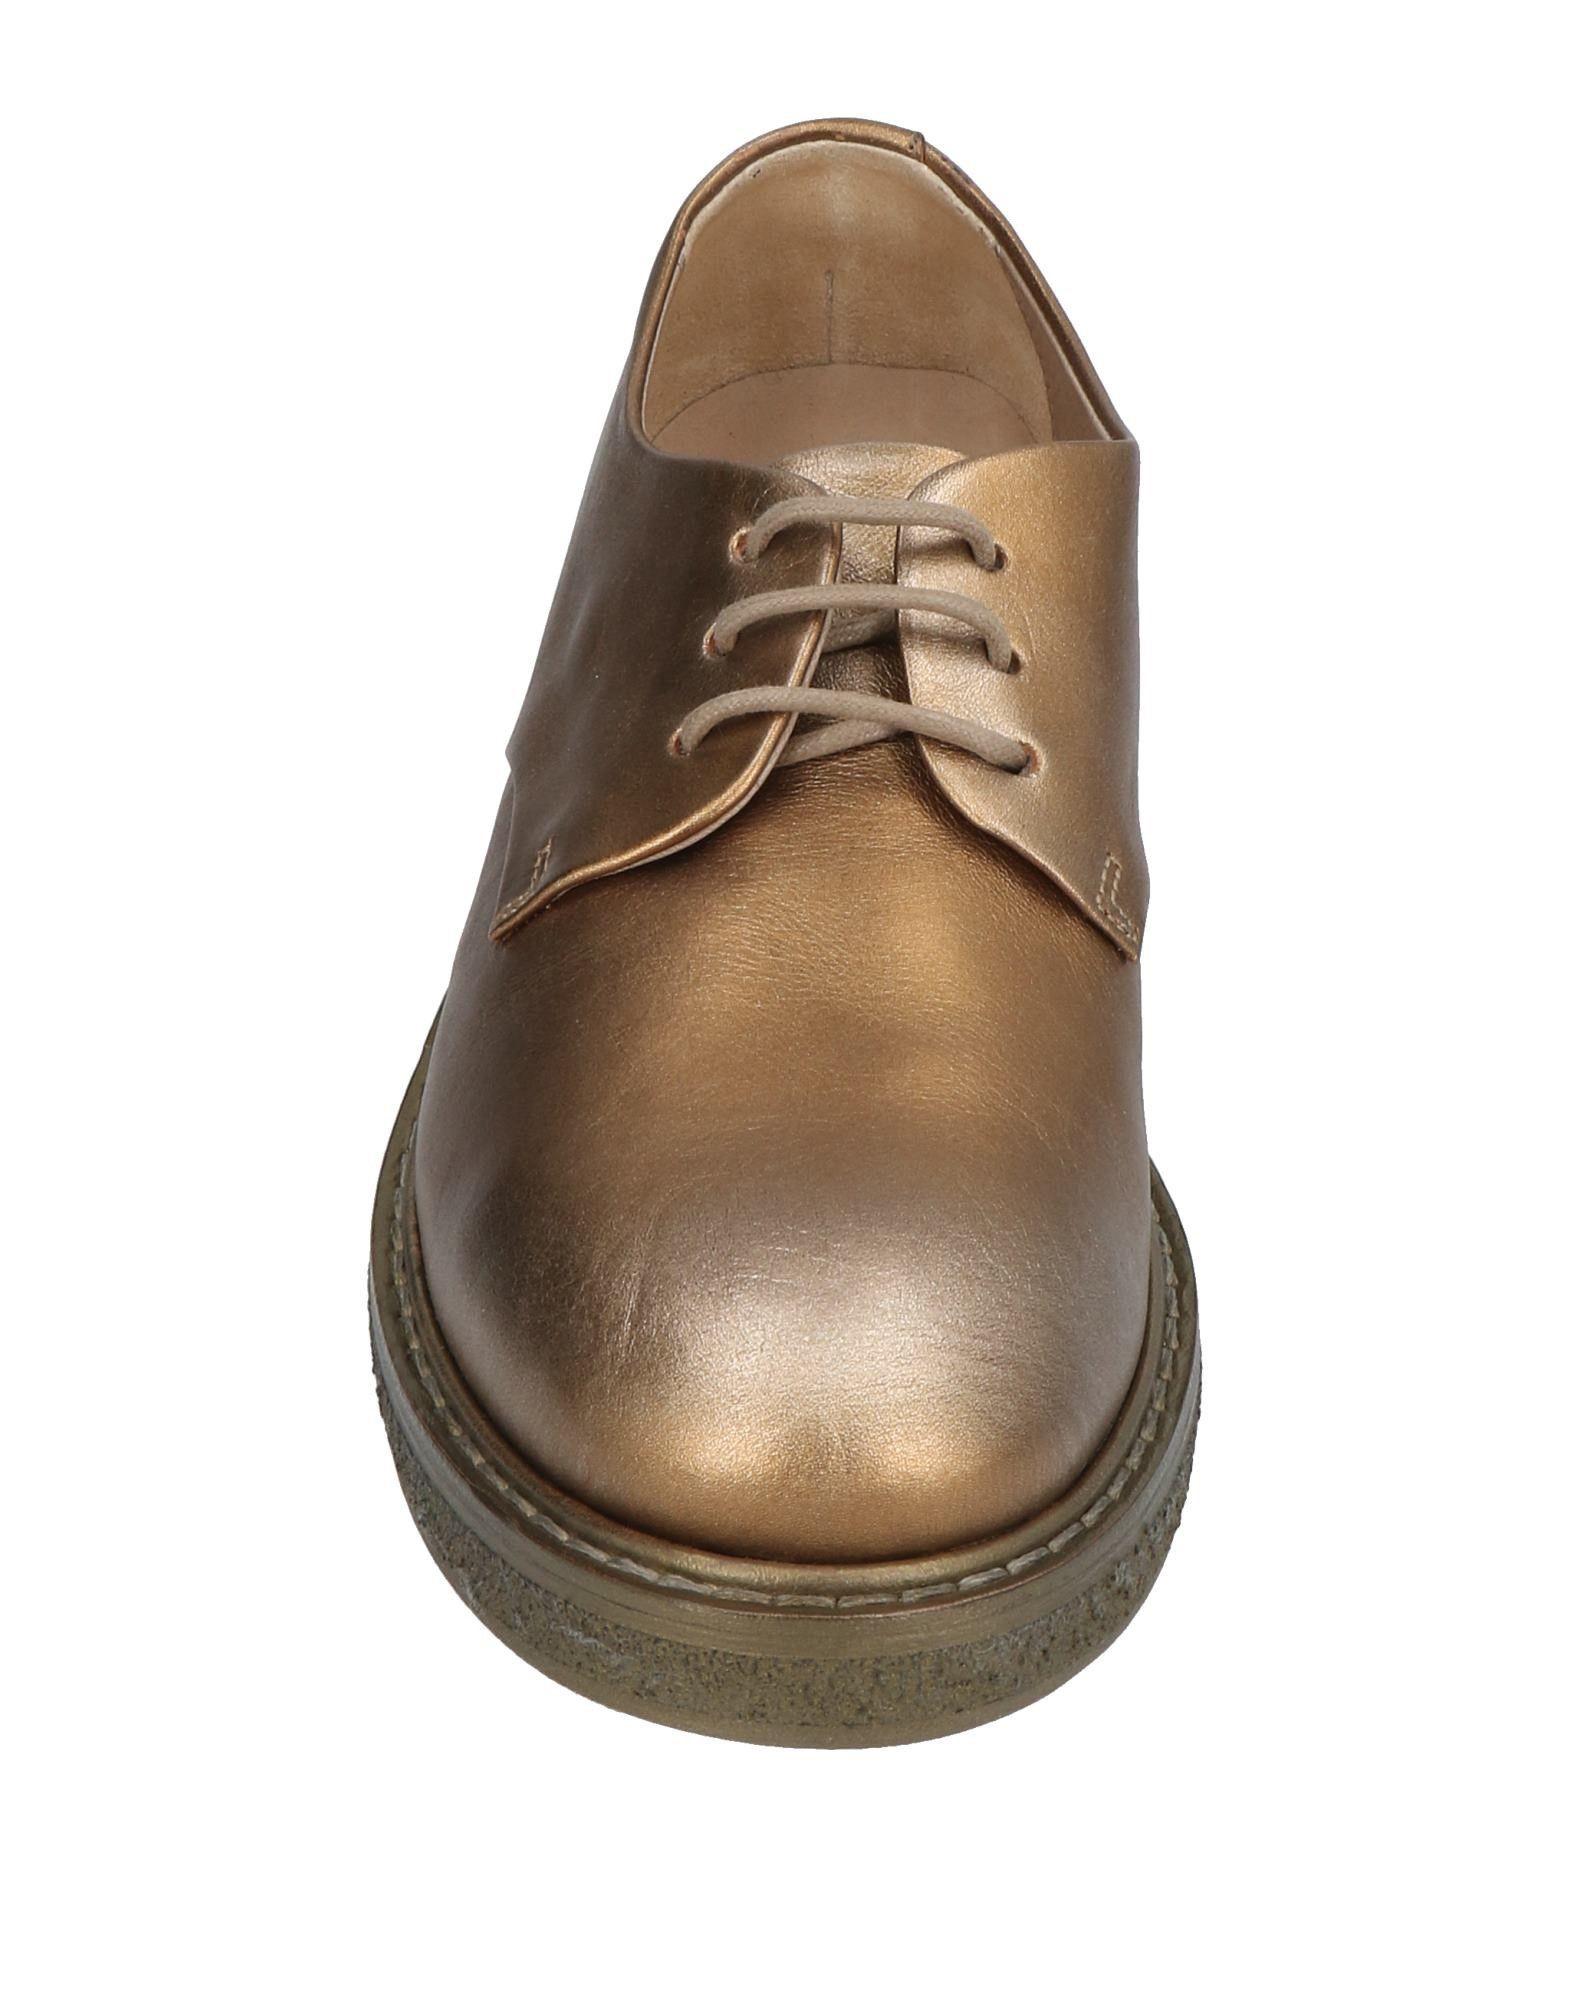 Marsèll Schnürschuhe Damen  11091475RR 11091475RR  Heiße Schuhe 2893a1